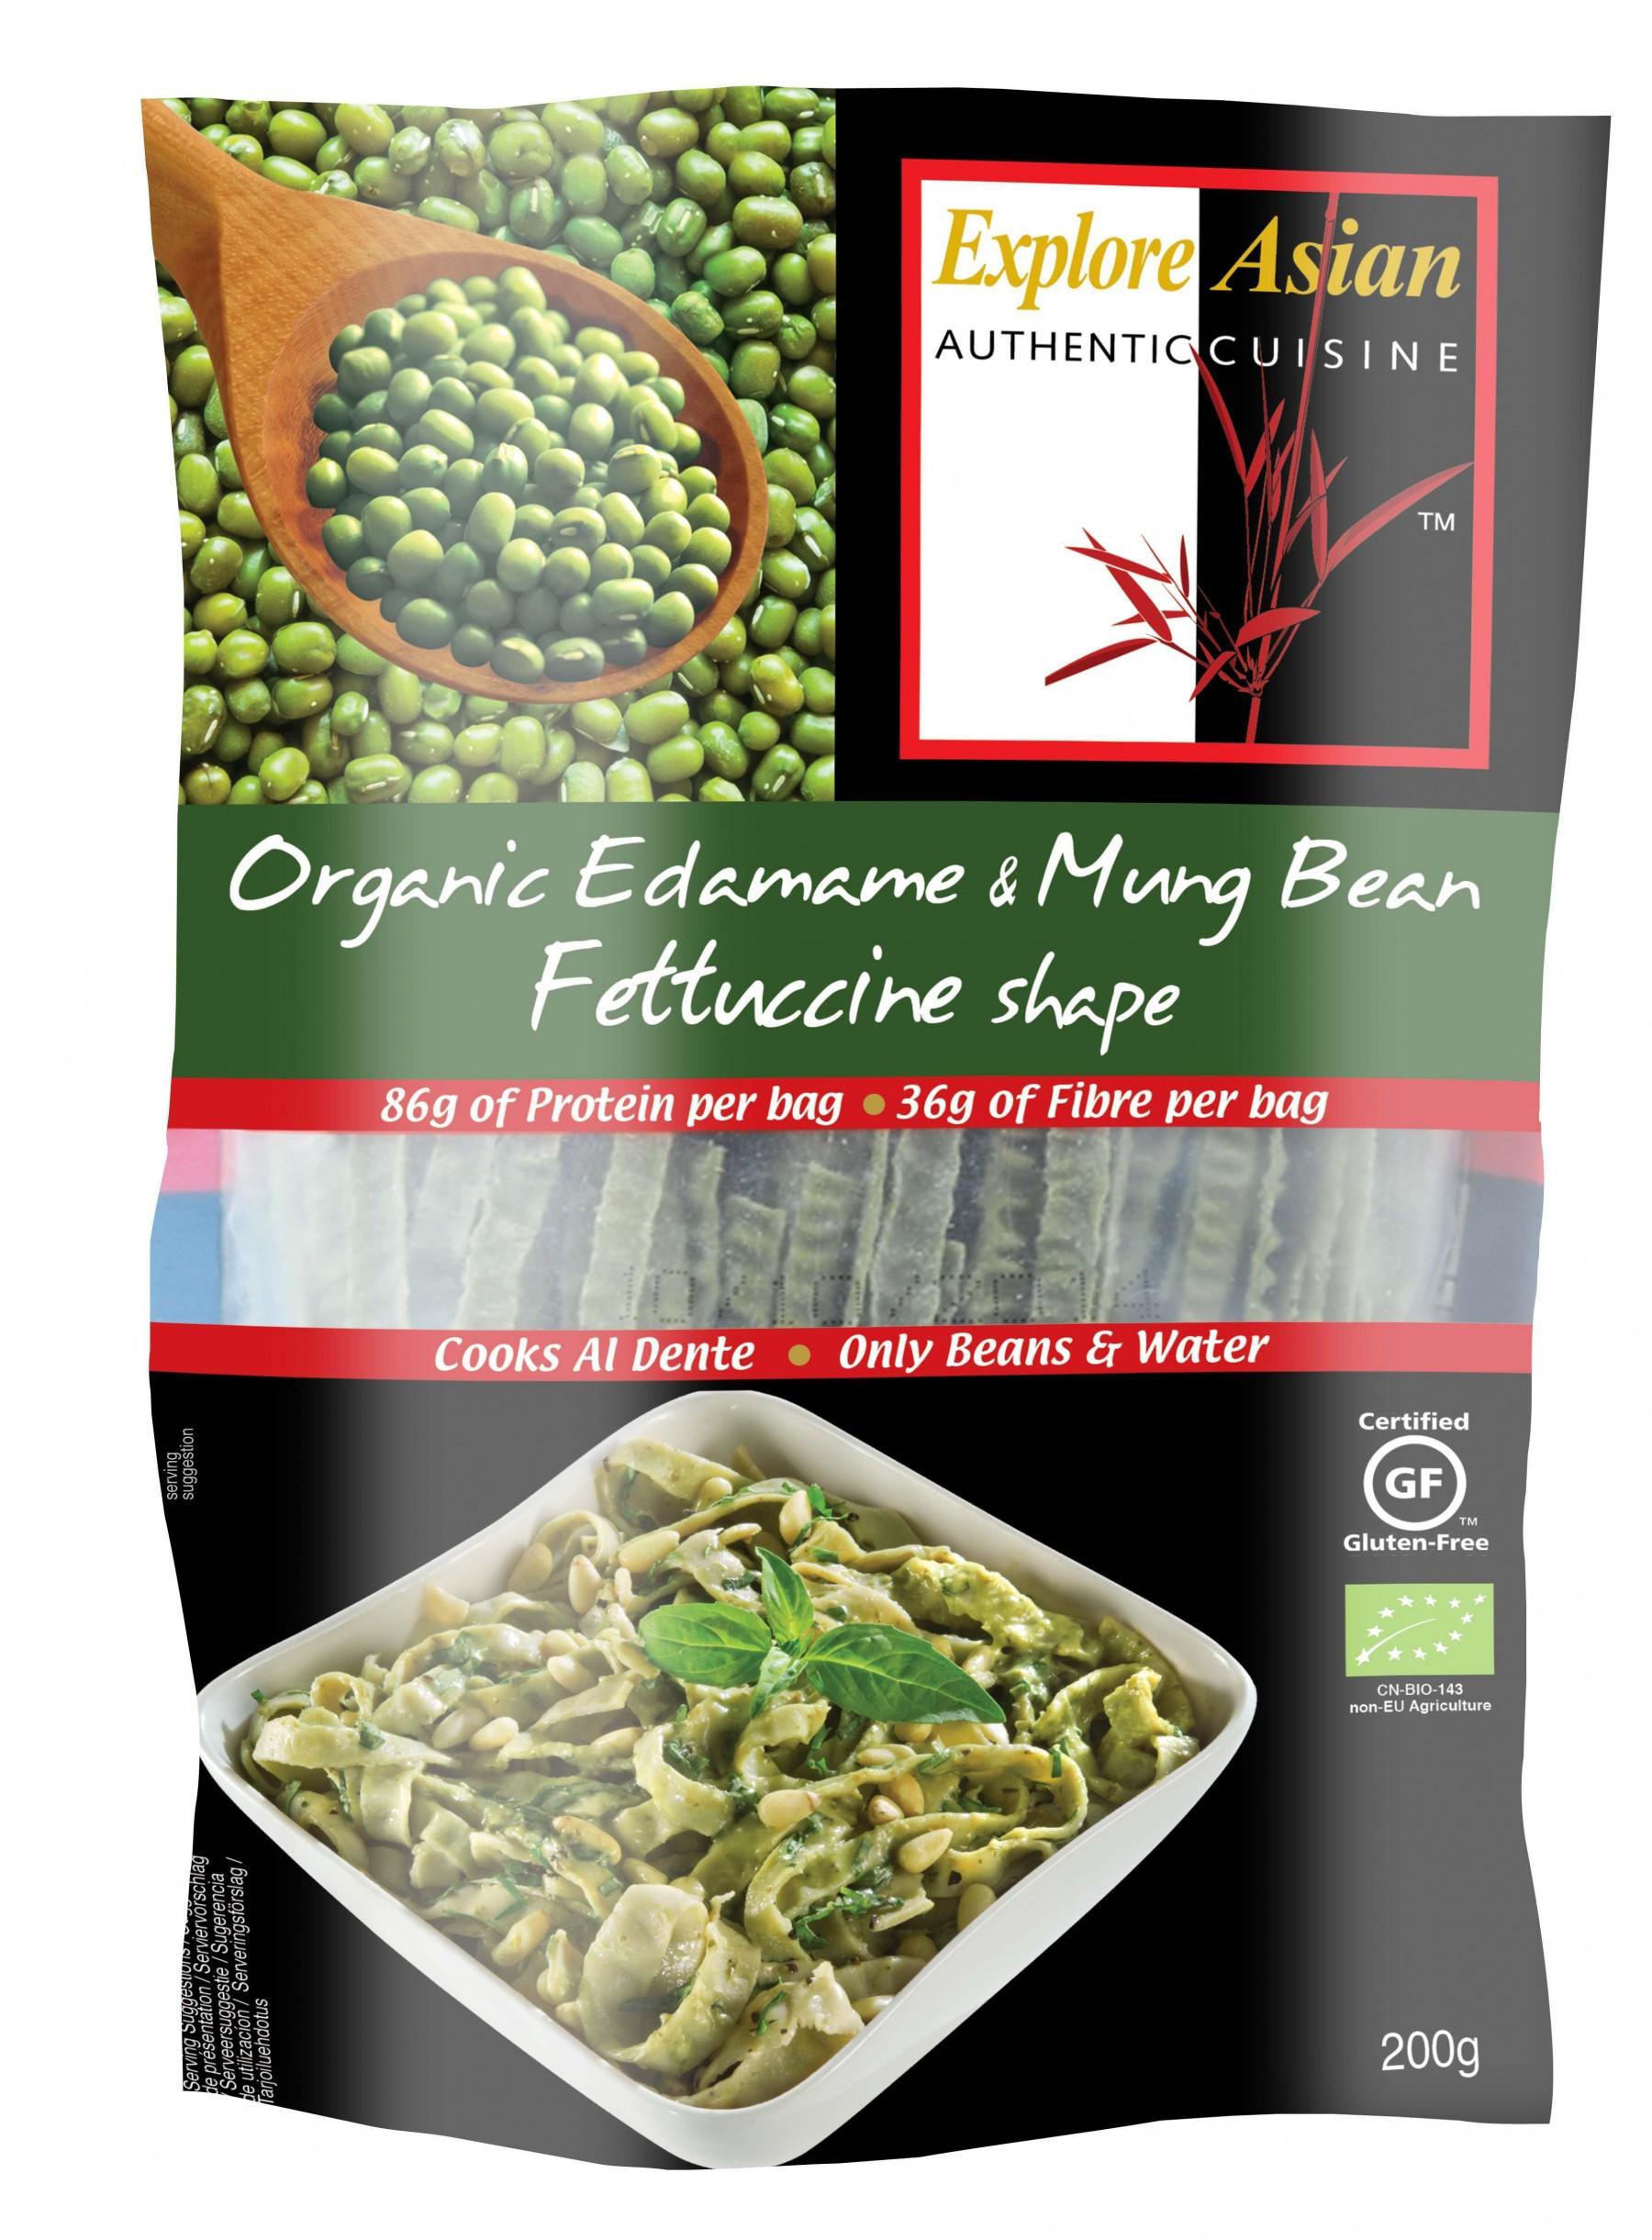 Explore Asian Organic Edamame Spaghetti  Explore Asian Organic Edamame & Mung Bean Fettuccine 200g